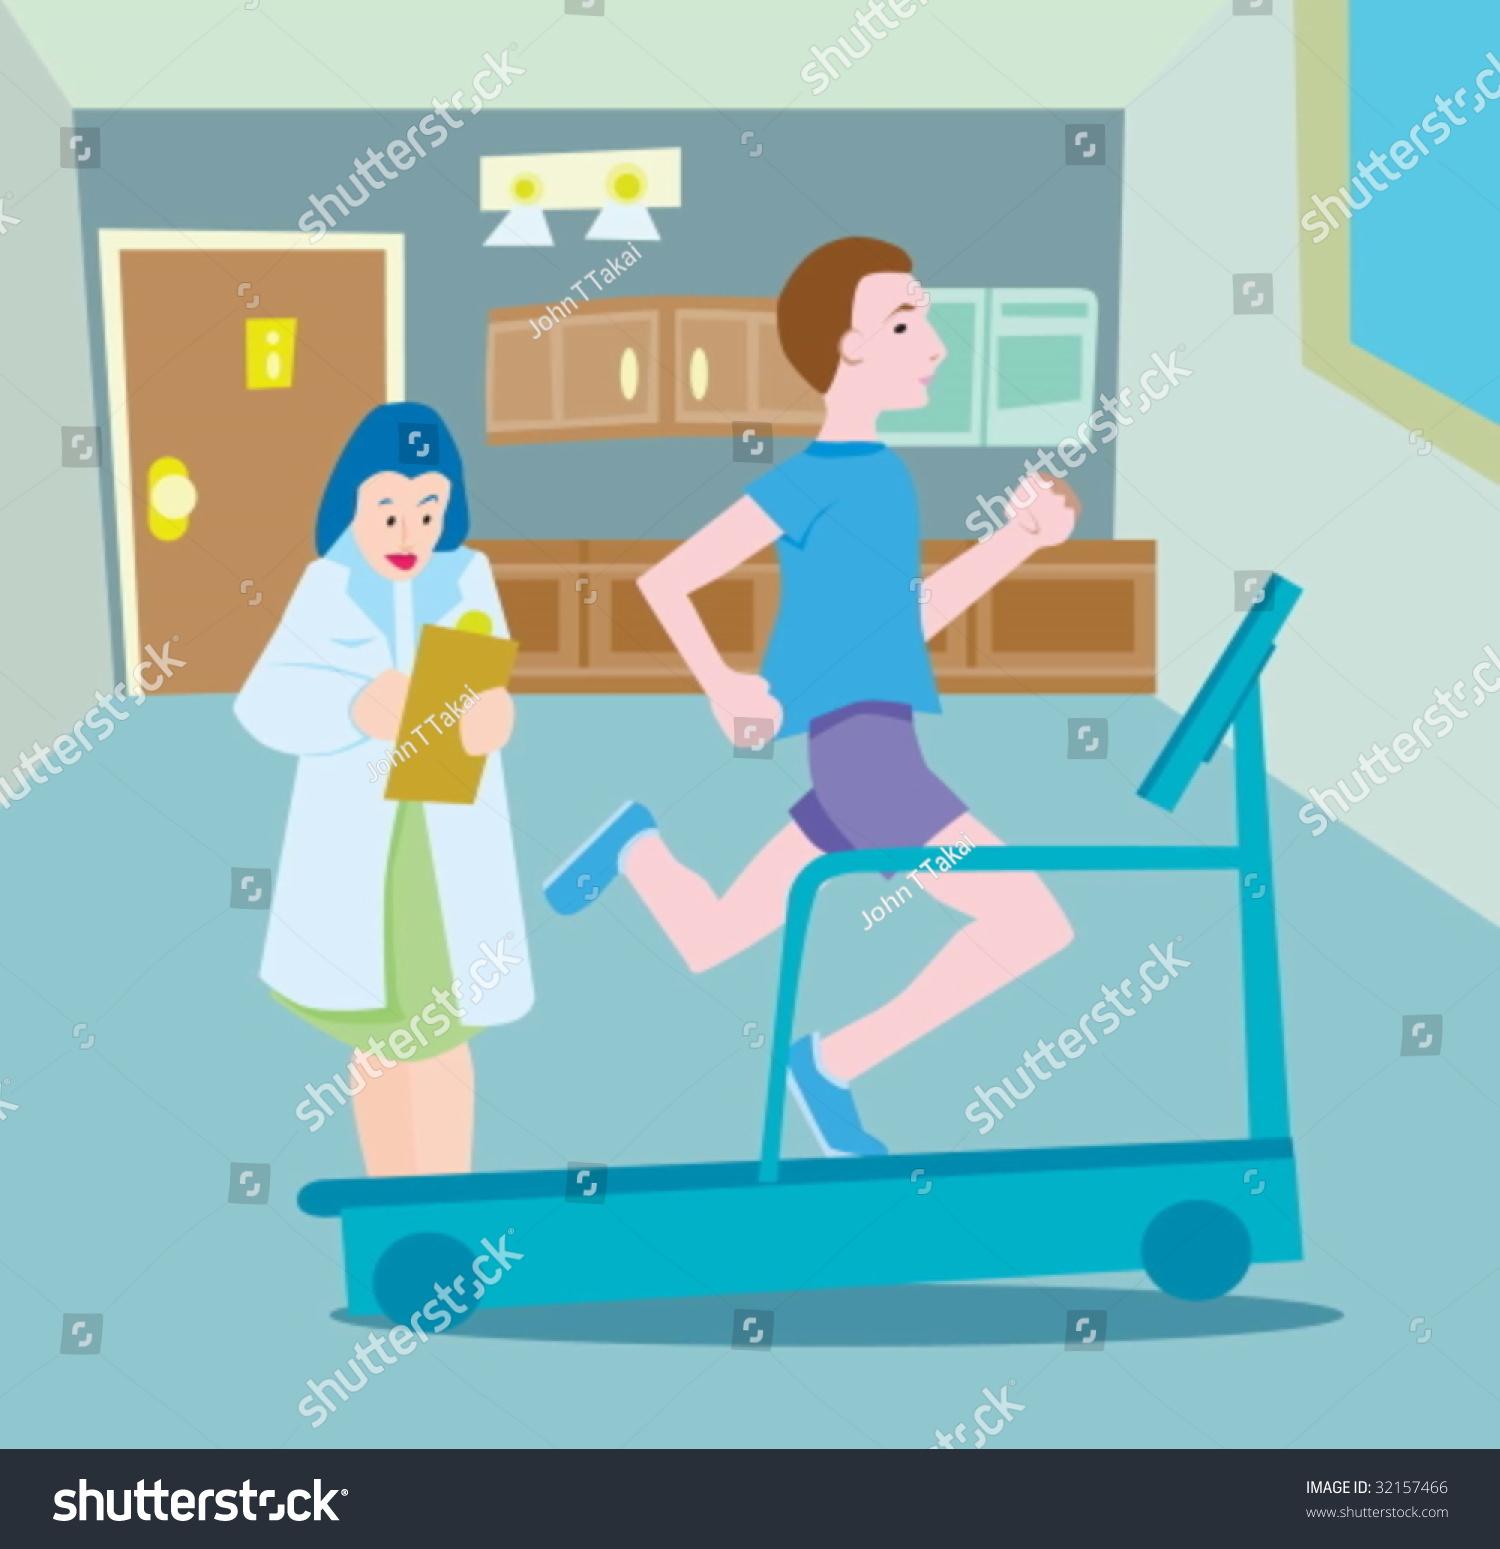 Stress Test Treadmill Time: Treadmill Test Stock Vector Illustration 32157466